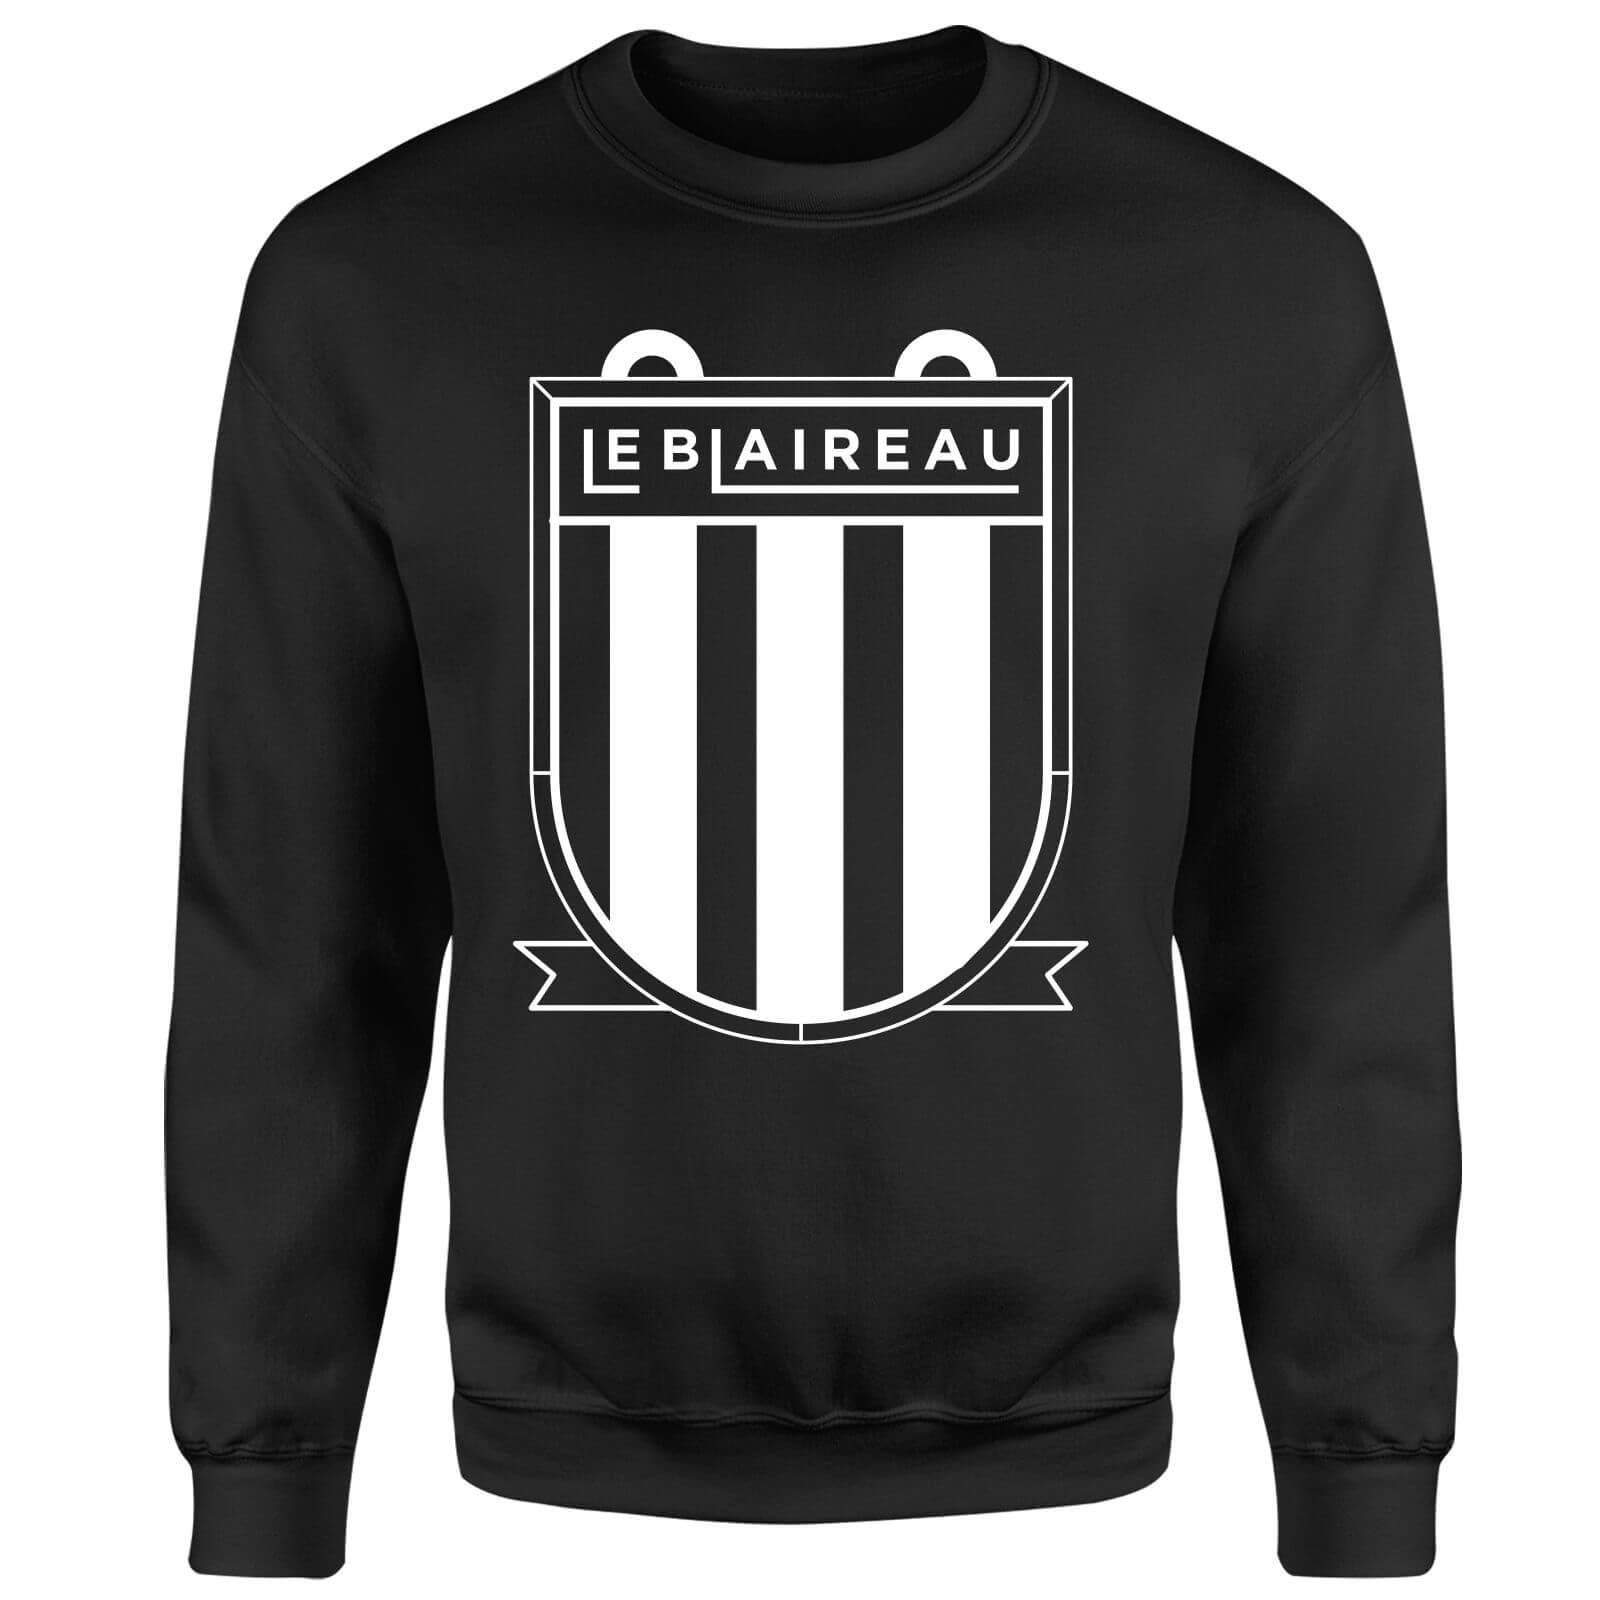 Le Blaireau Sweatshirt - M - Schwarz